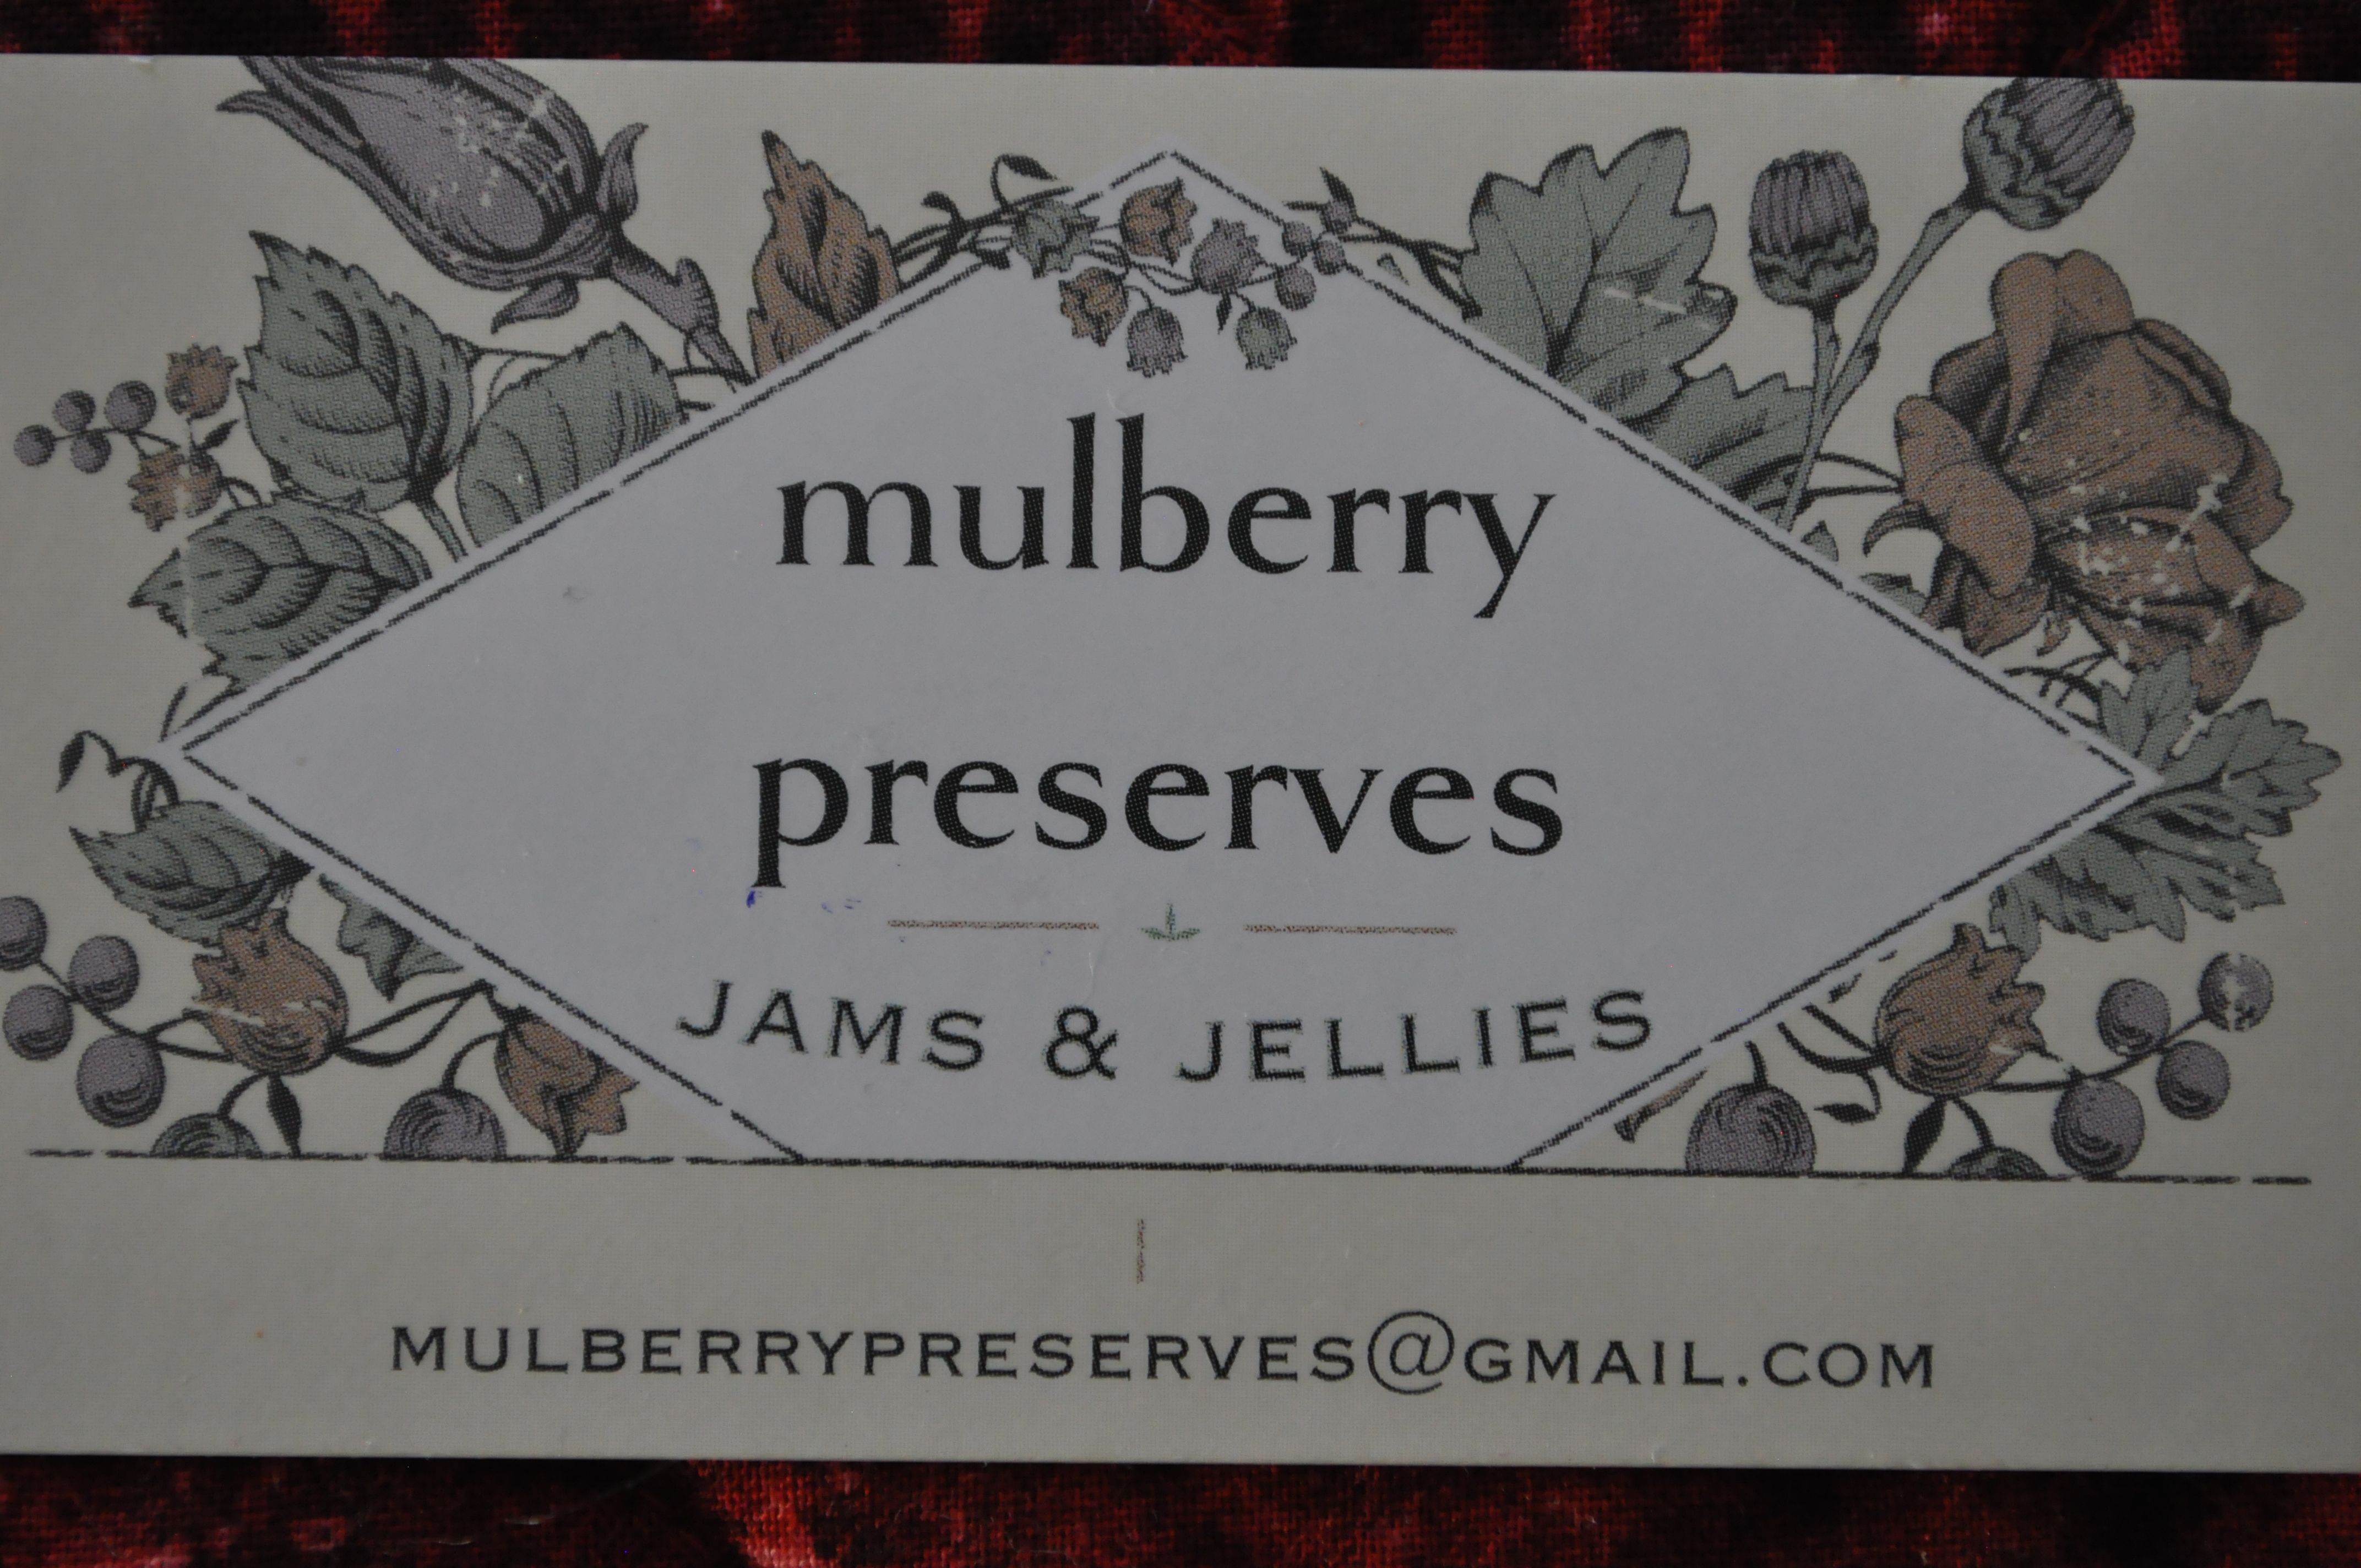 Mulberry Preserves